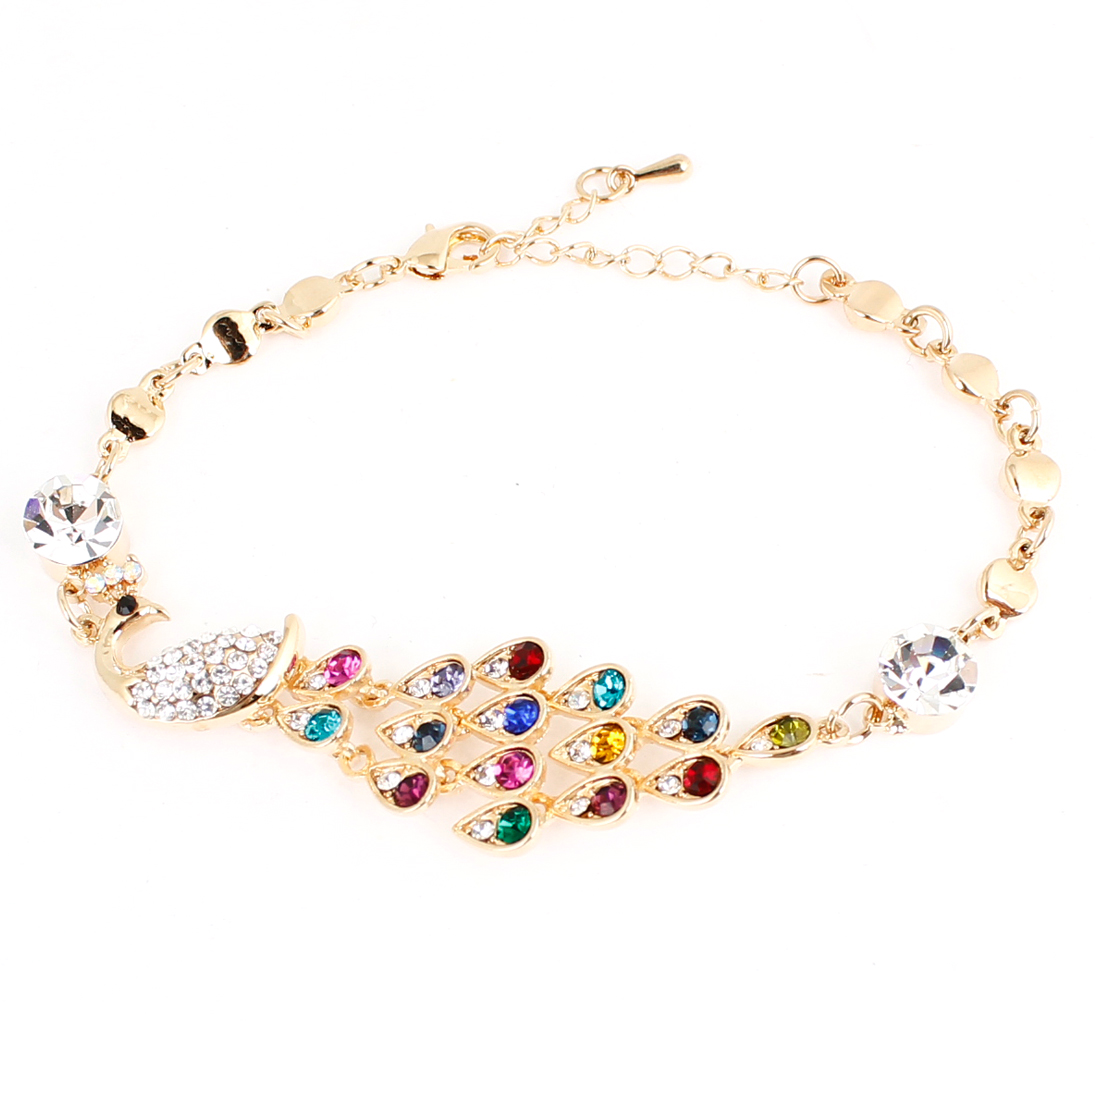 Lady Rhinestone Detailing Peacock Design Adjustable Gold Tone Wrist Bracelet